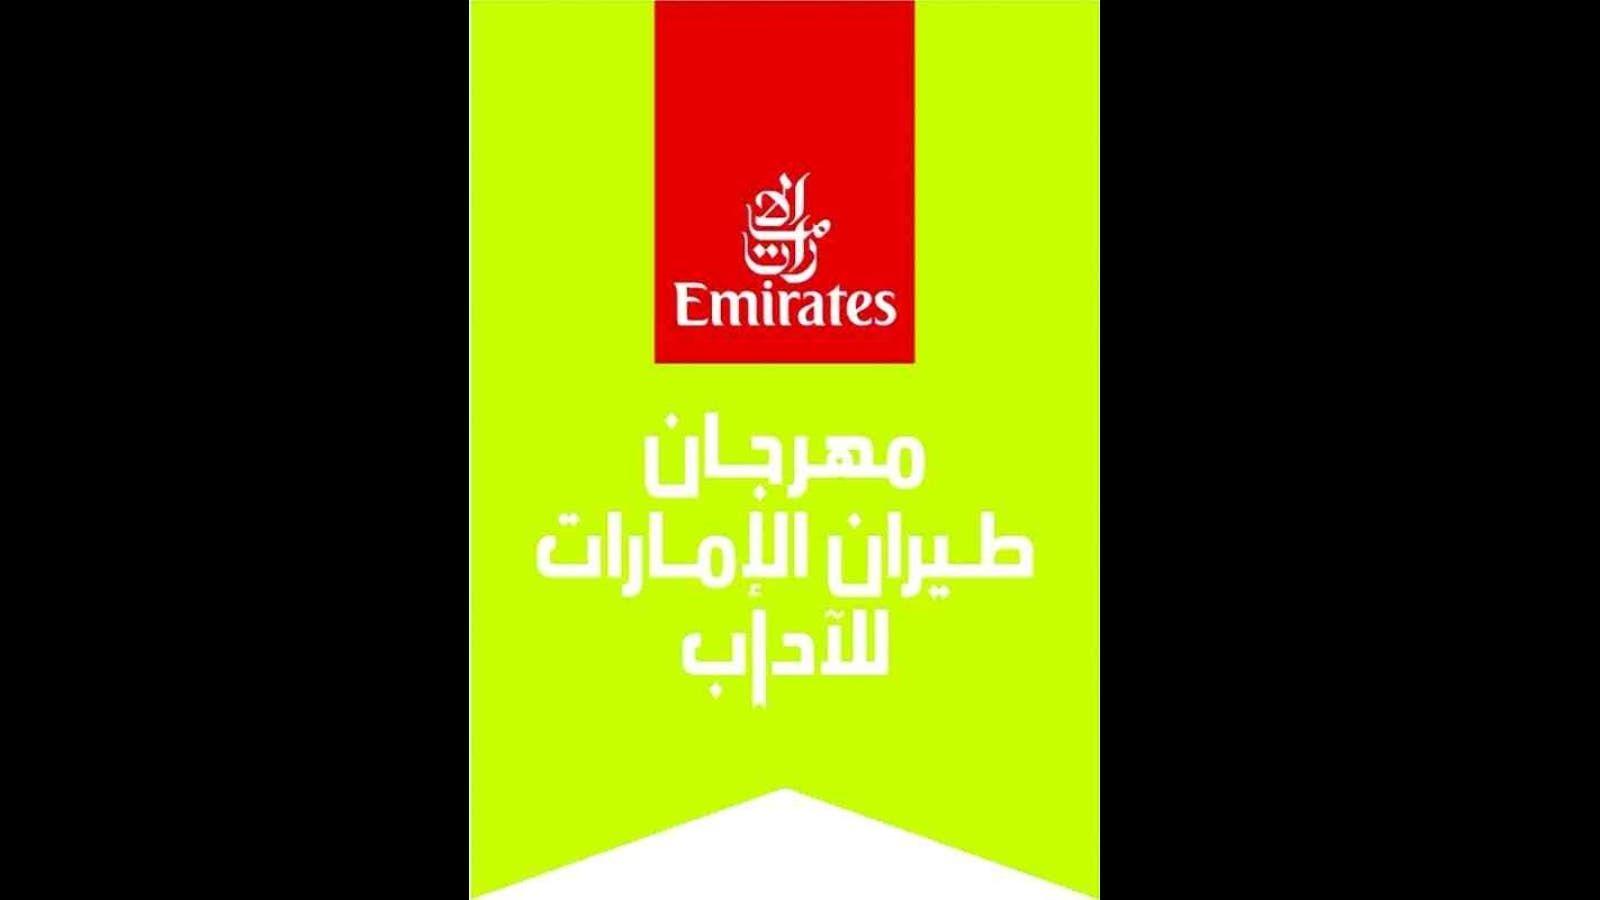 اختتام مهرجان طيران الإمارات للآداب بحضور استثنائي فعلي وافتراضي In 2021 Calm Artwork Calm Keep Calm Artwork